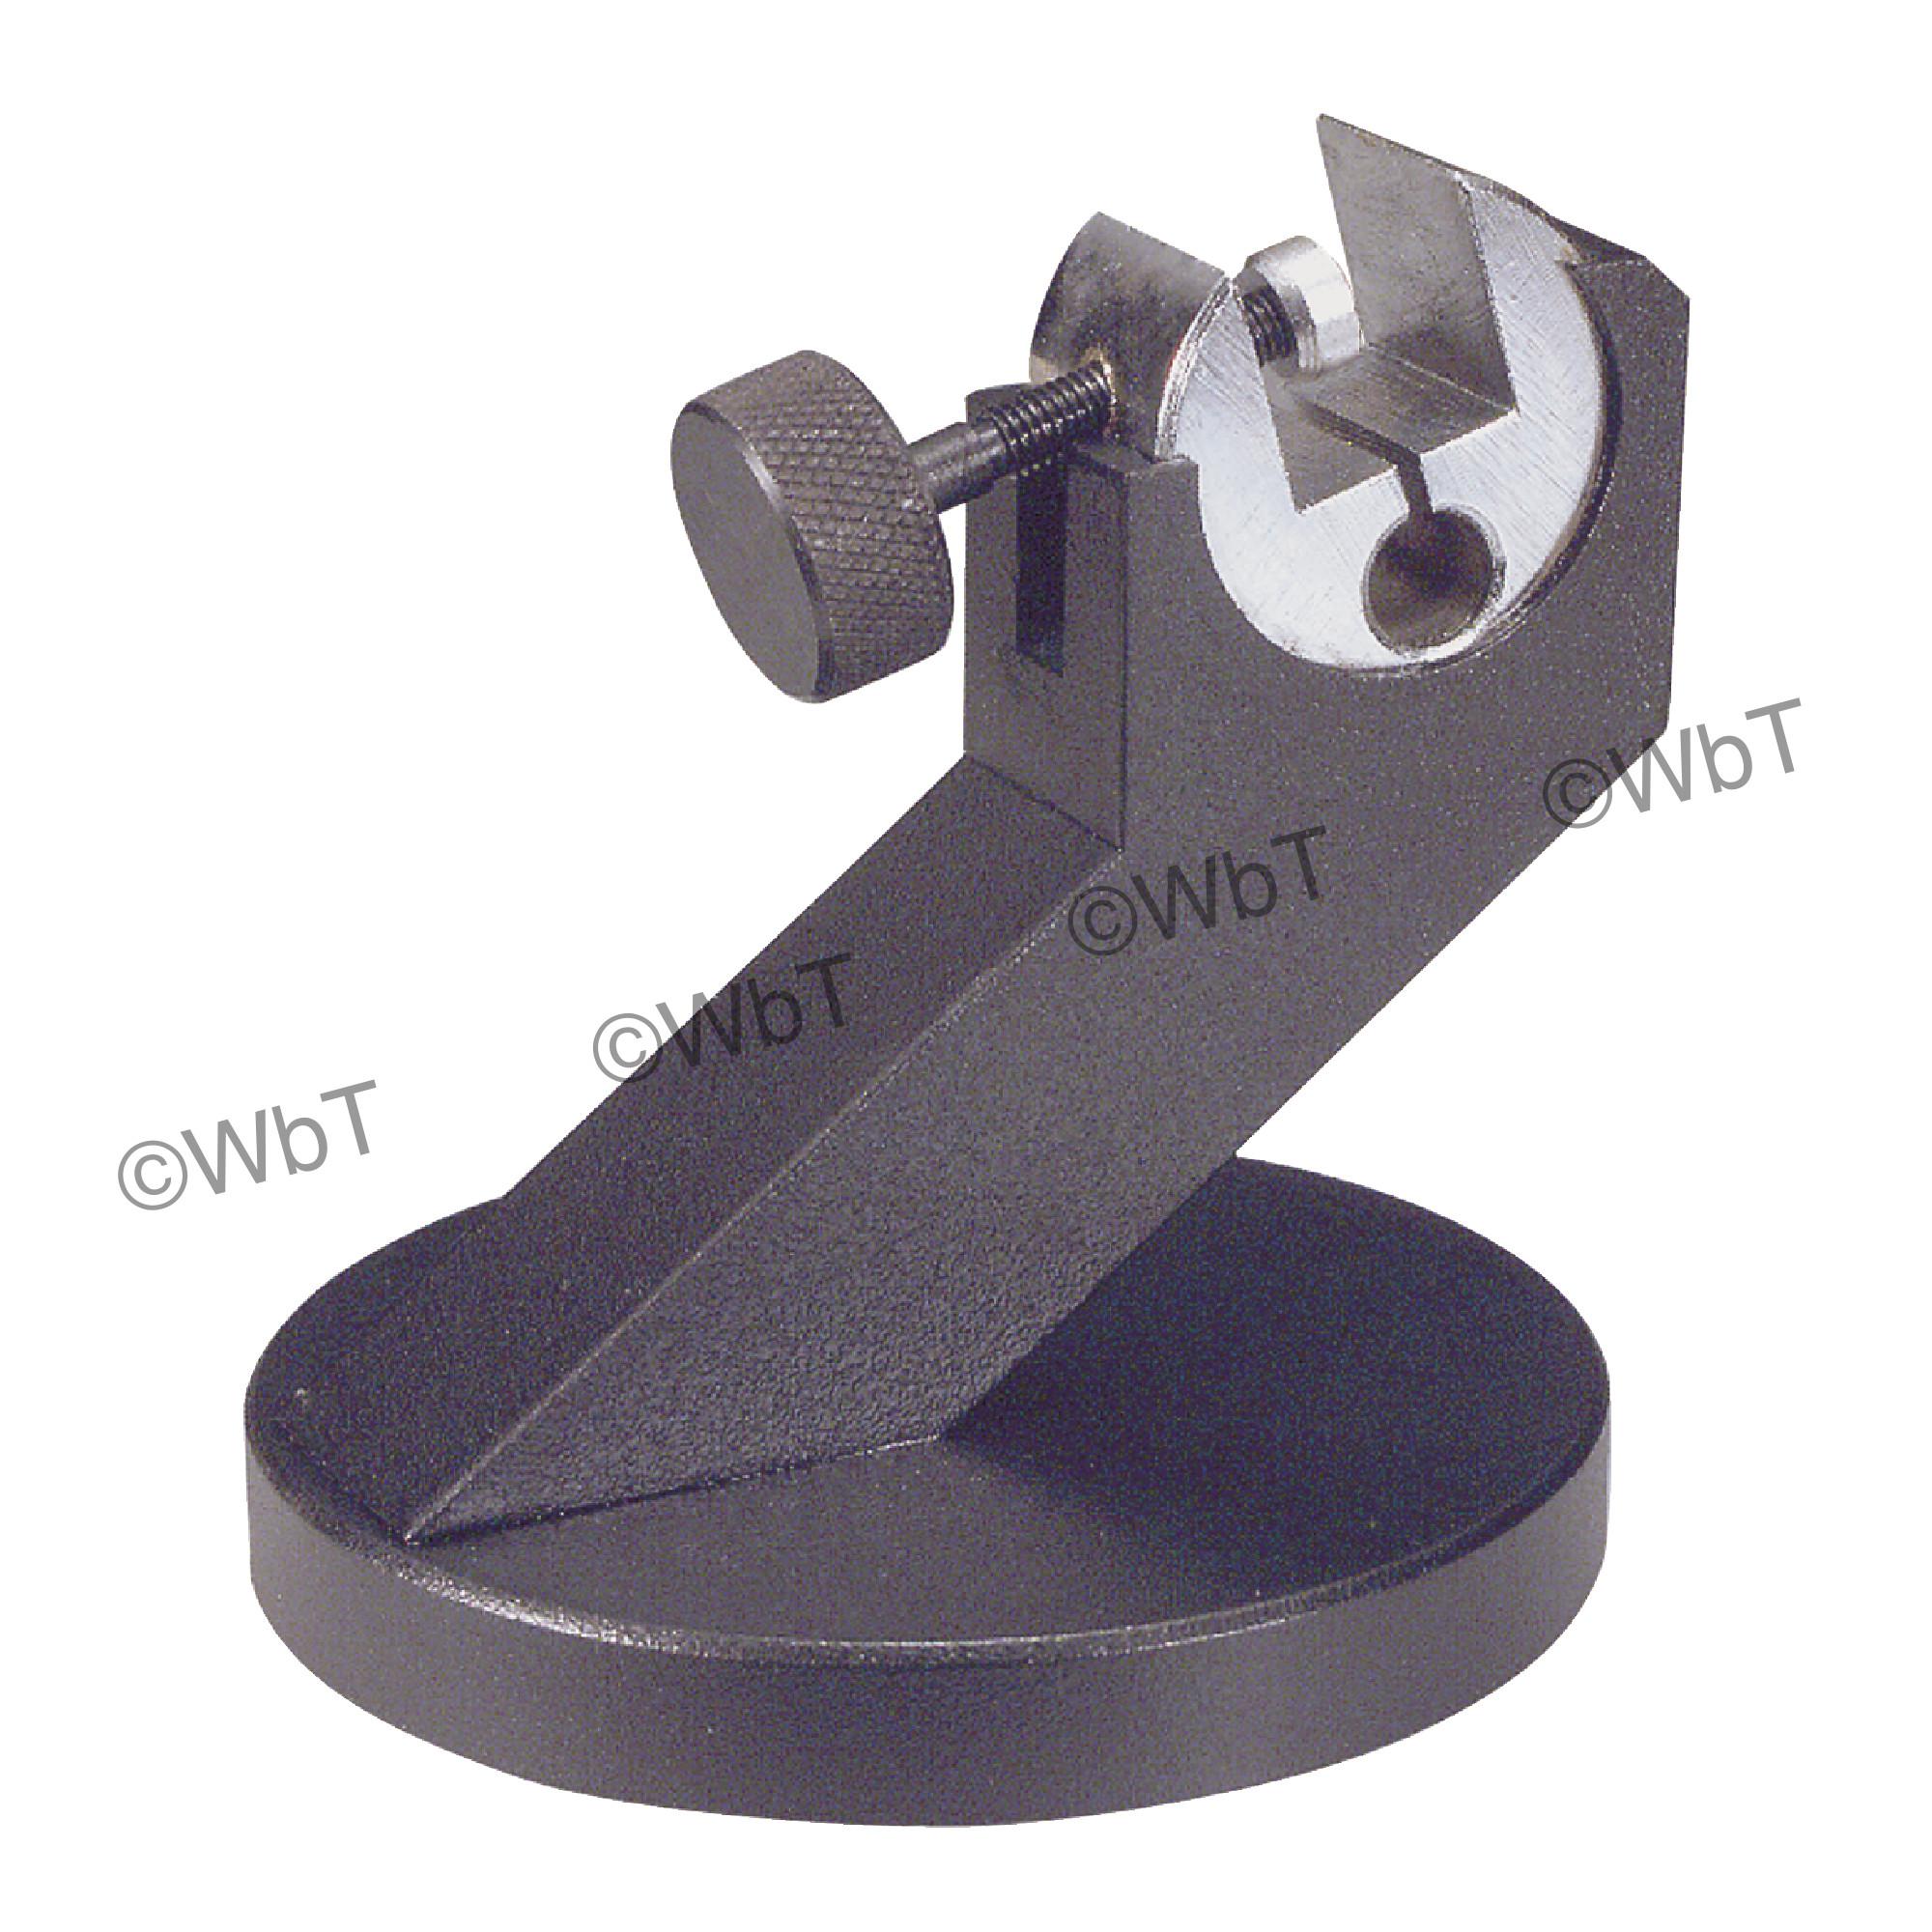 Adjustable Micrometer Stand